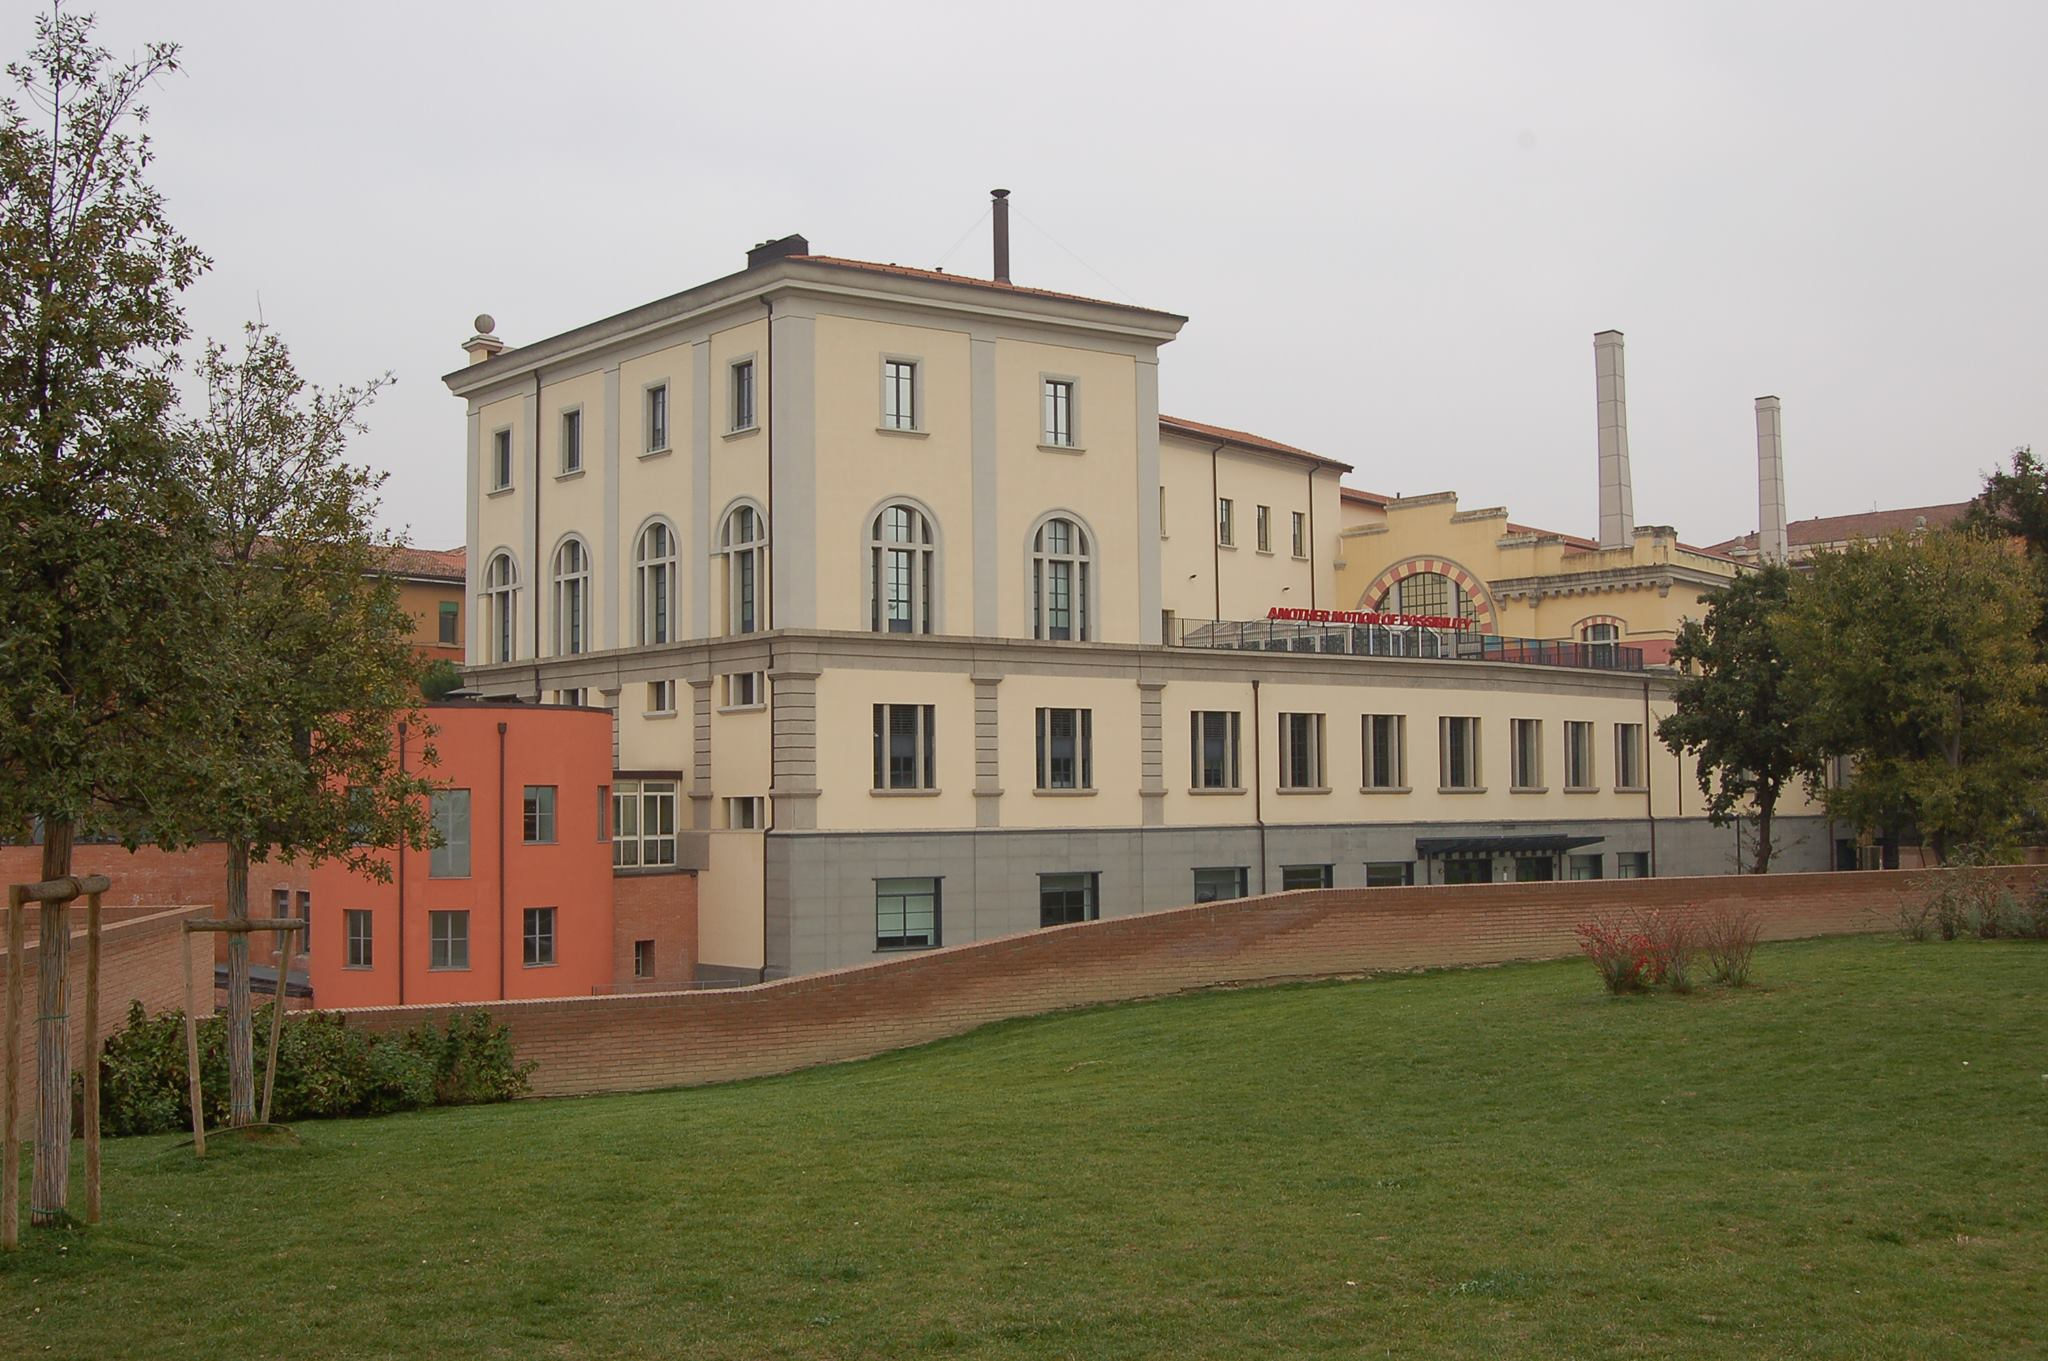 MAMbo – Museum of Modern Art of Bologna